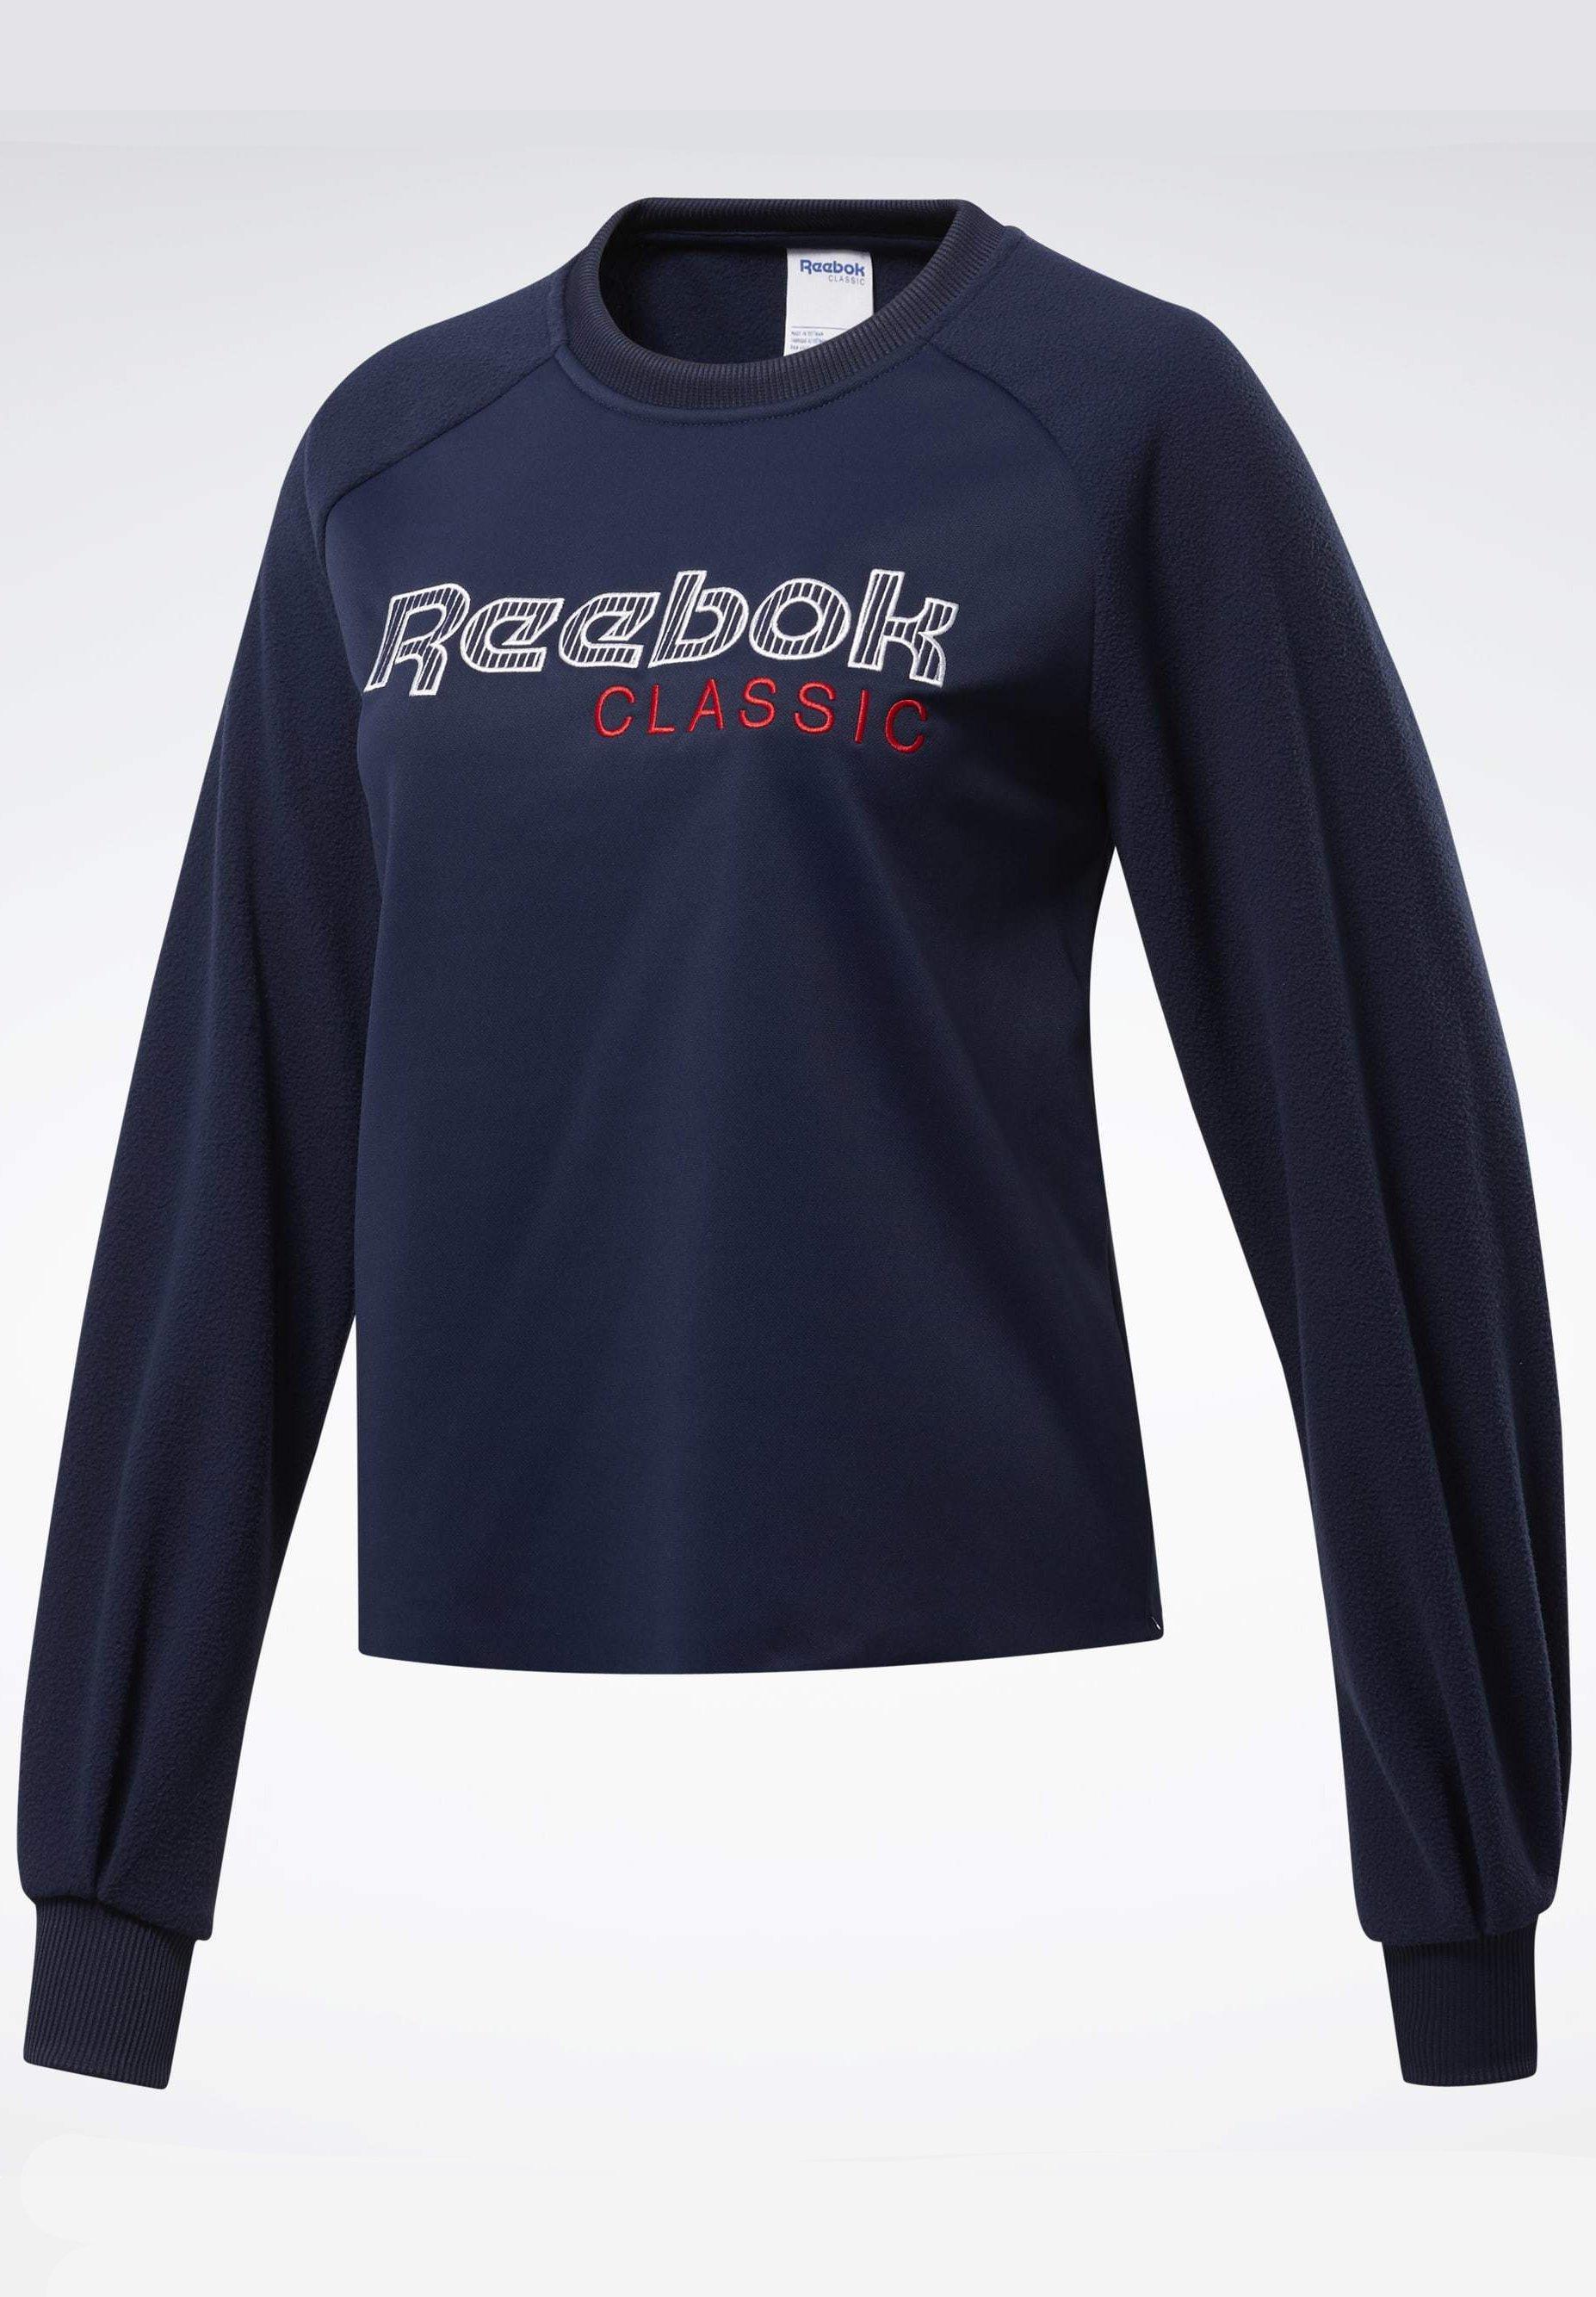 Reebok Classics bright blue logo sweatshirt | Sweatshirts